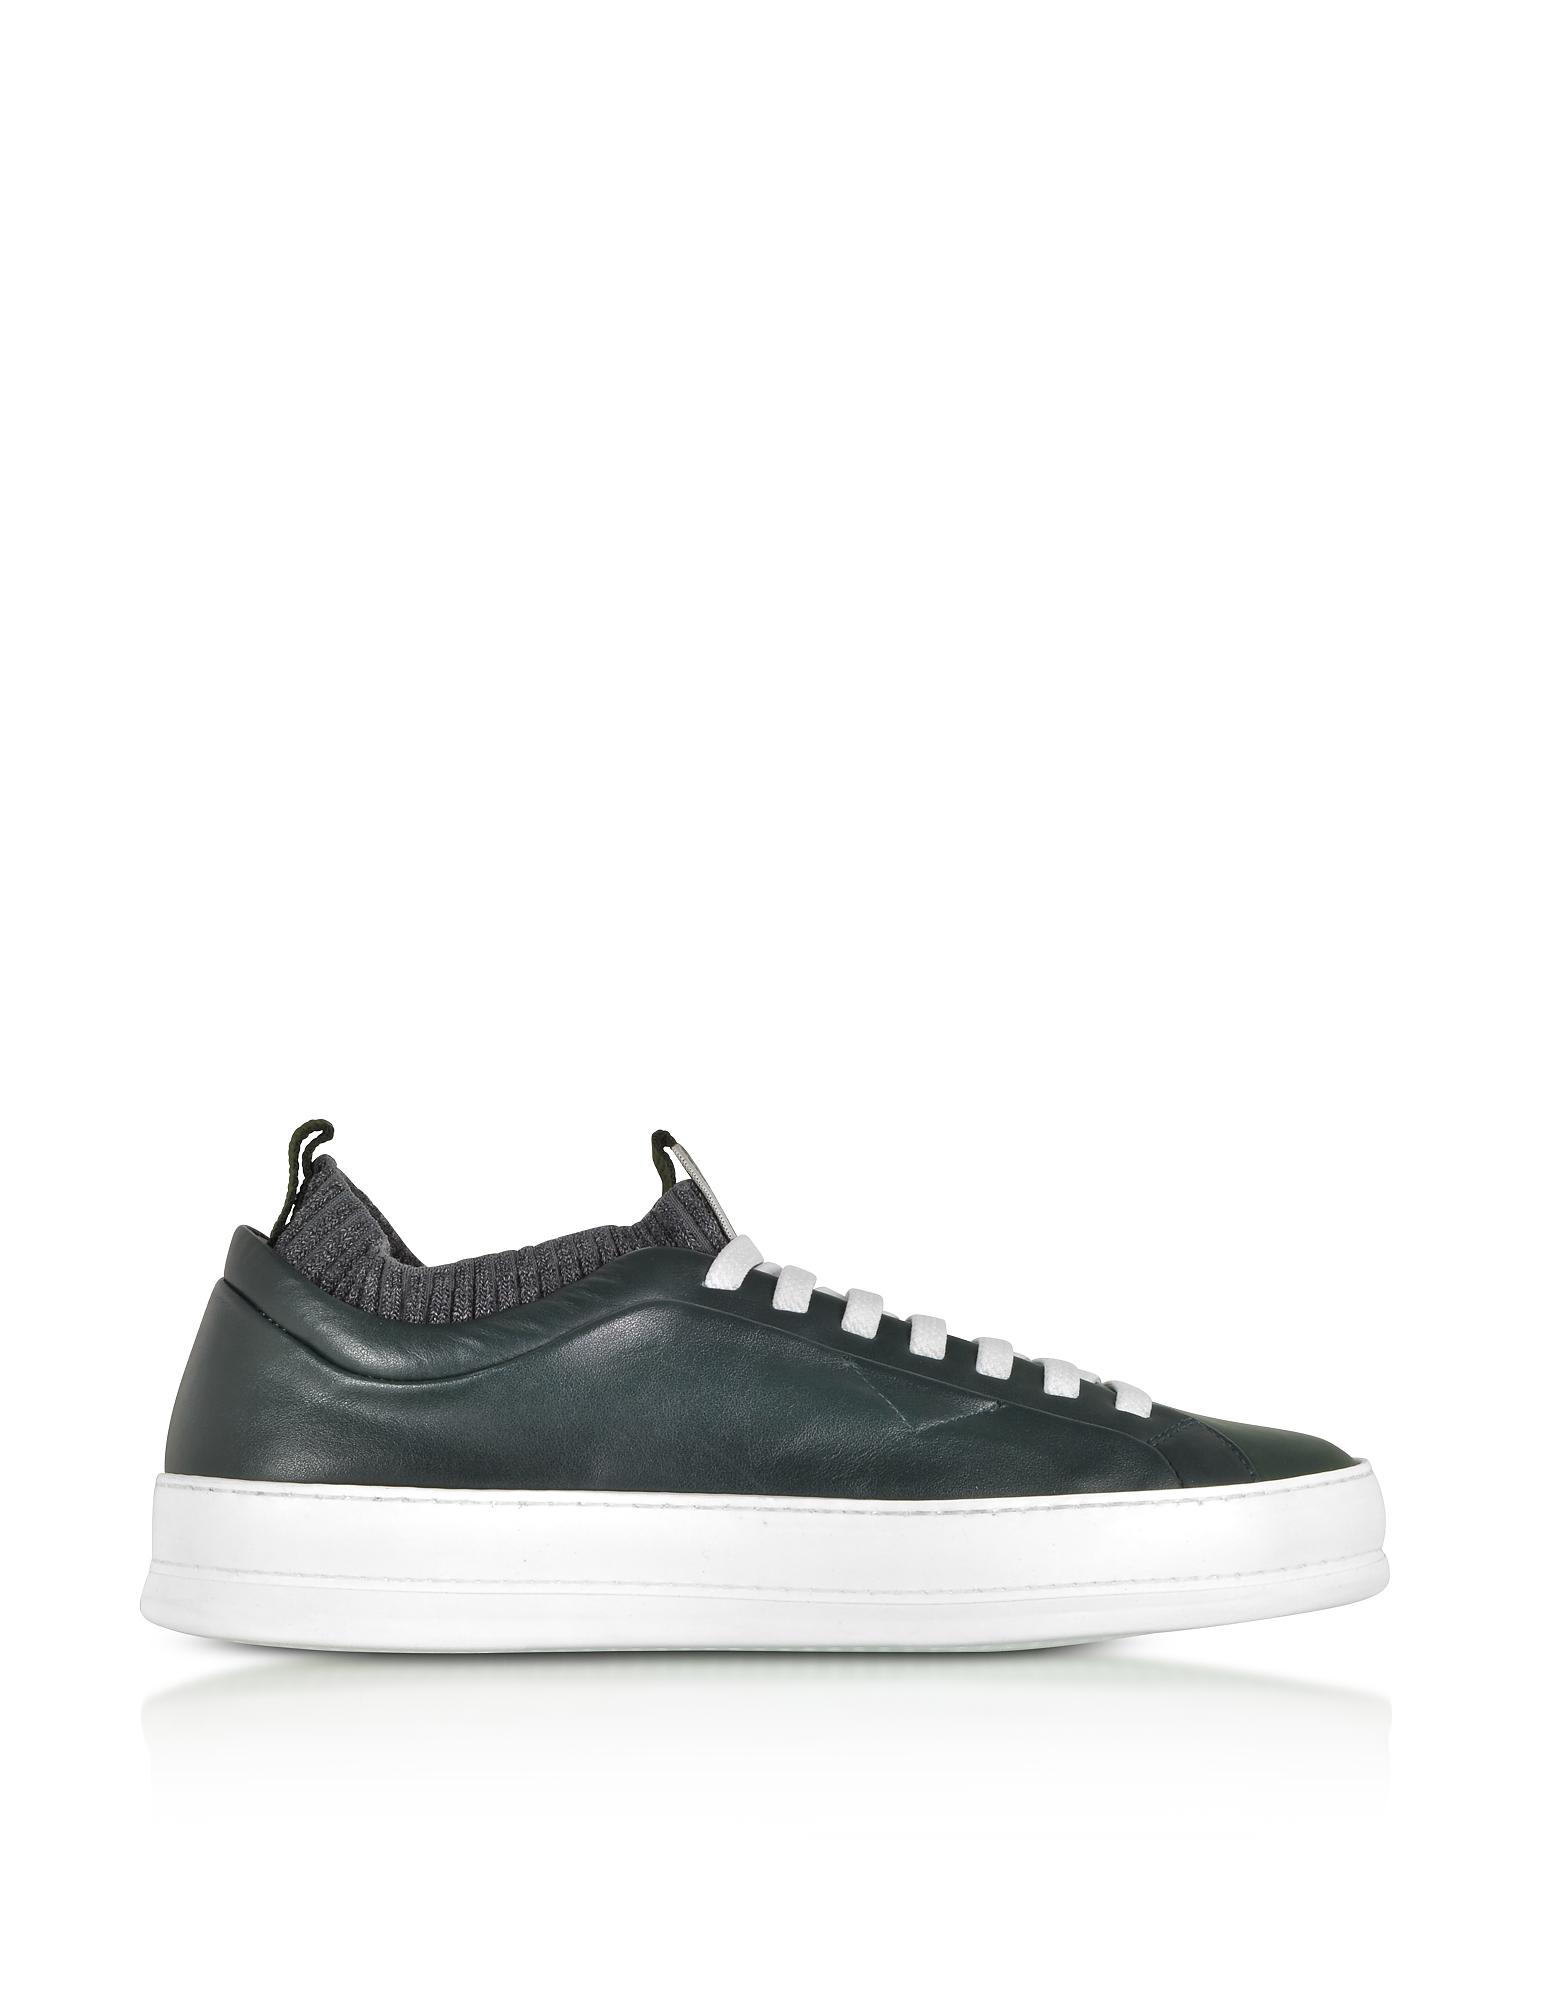 Ermenegildo Zegna Shoes, Iacopo Green Low Top Sneakers